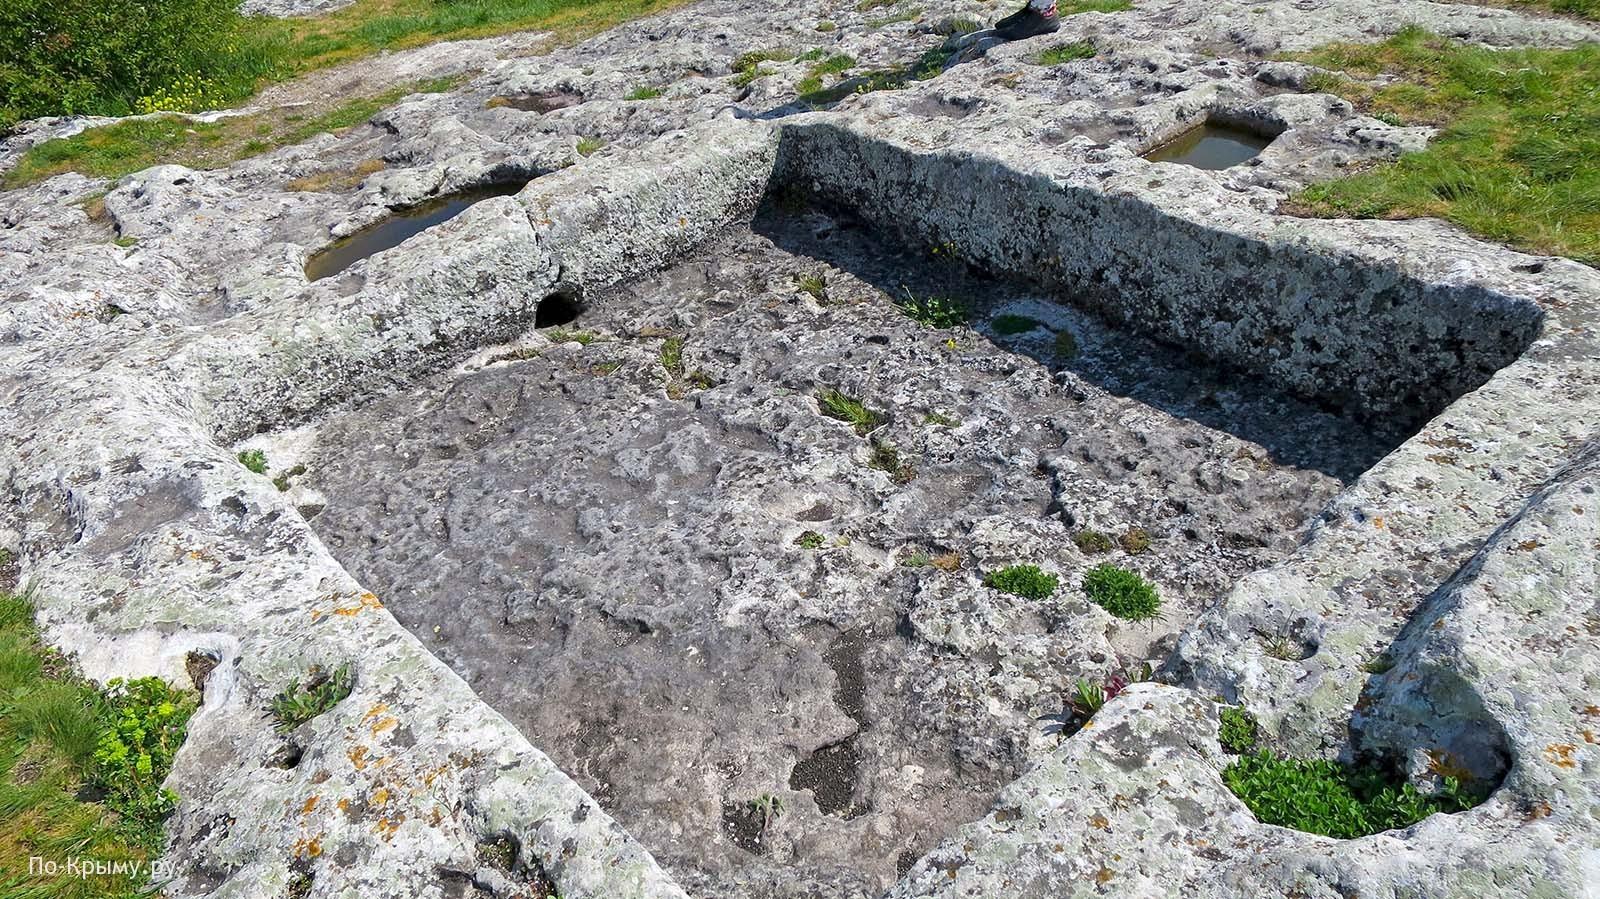 Каменный тарапан для давки винограда и сбора сока